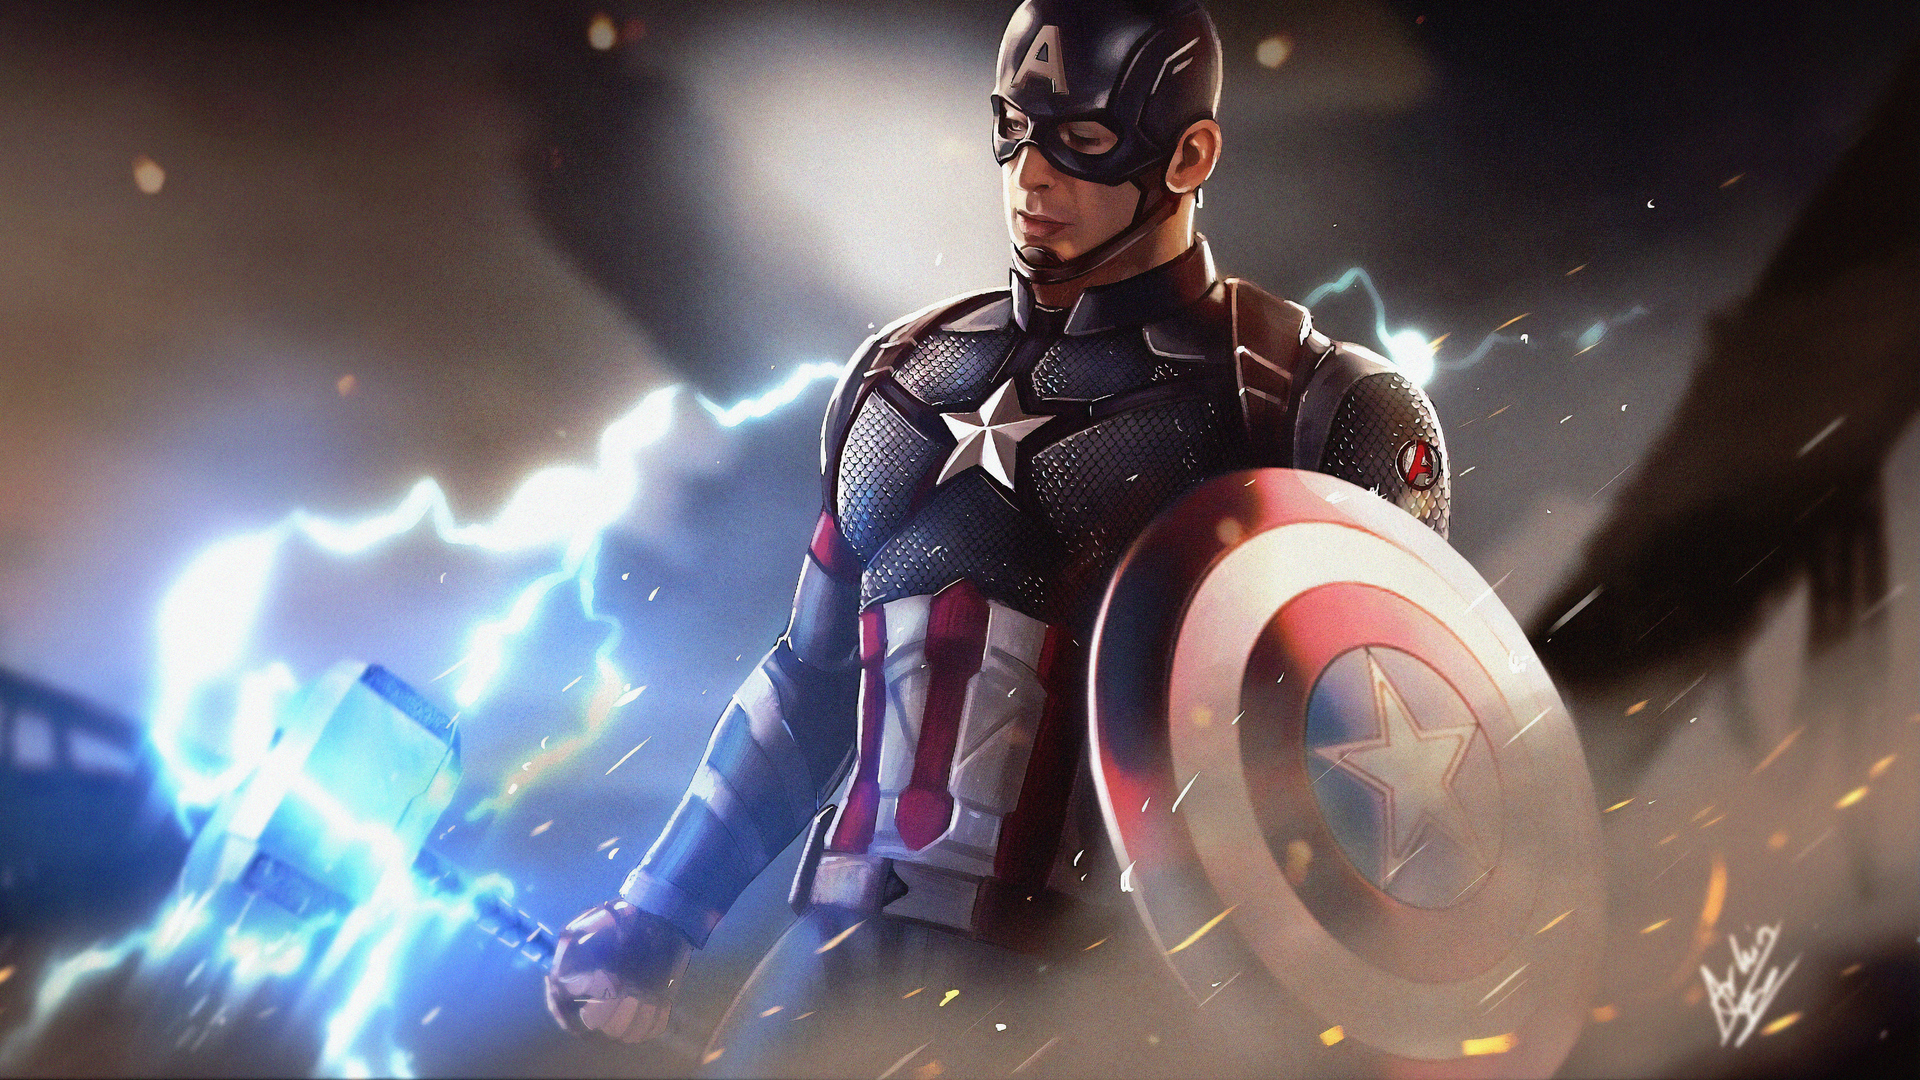 Captain America Shield Marvel Comics Marvel Cinematic Universe The Avengers Mjolnir 1920x1080